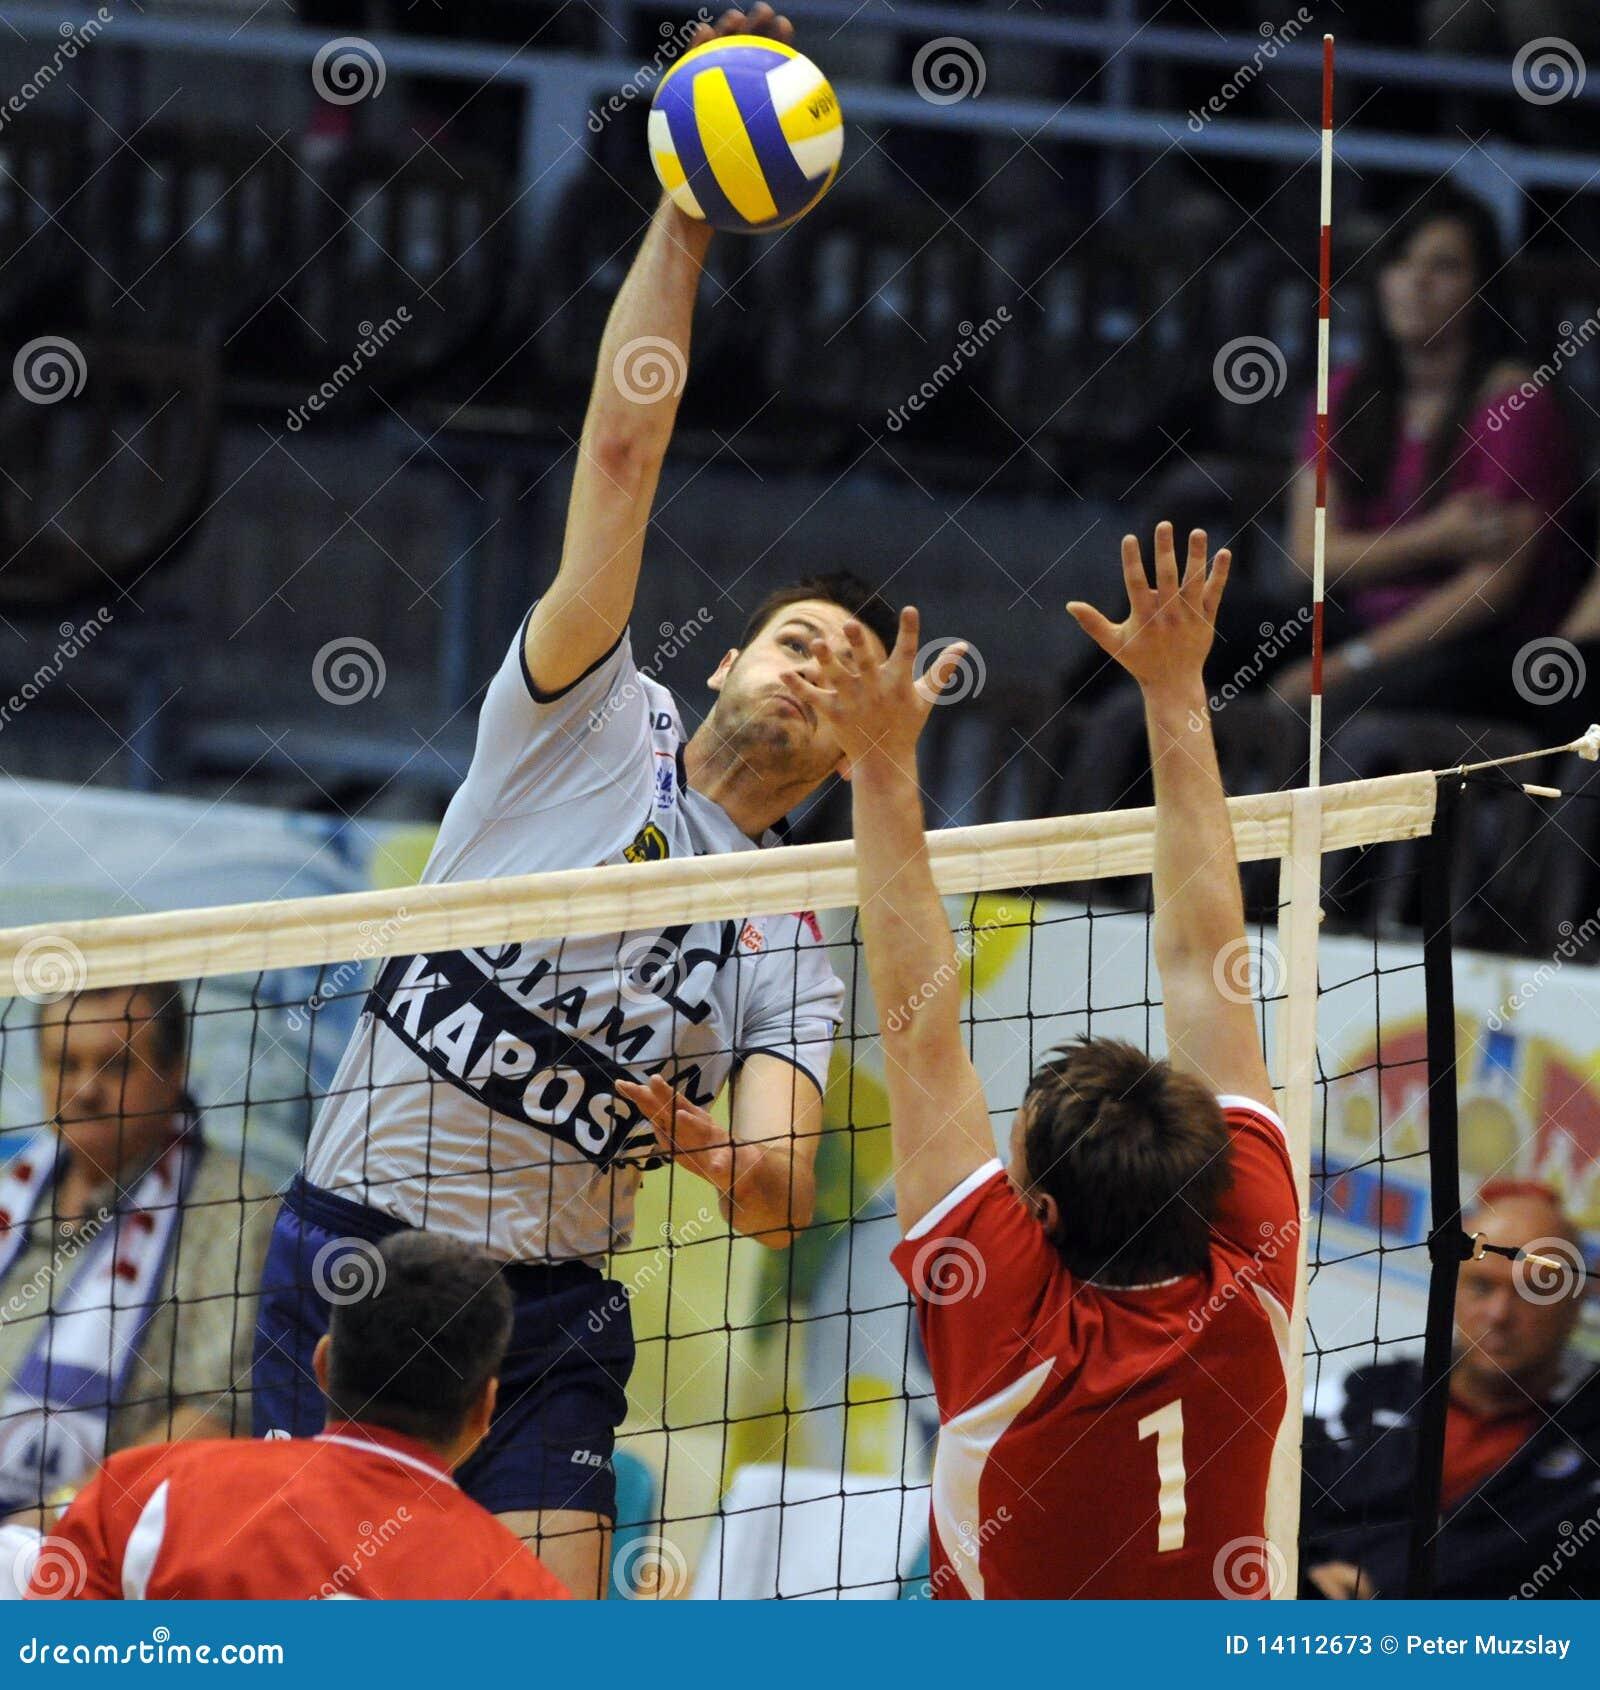 Kecskemet - Kaposvar Volleyballspiel